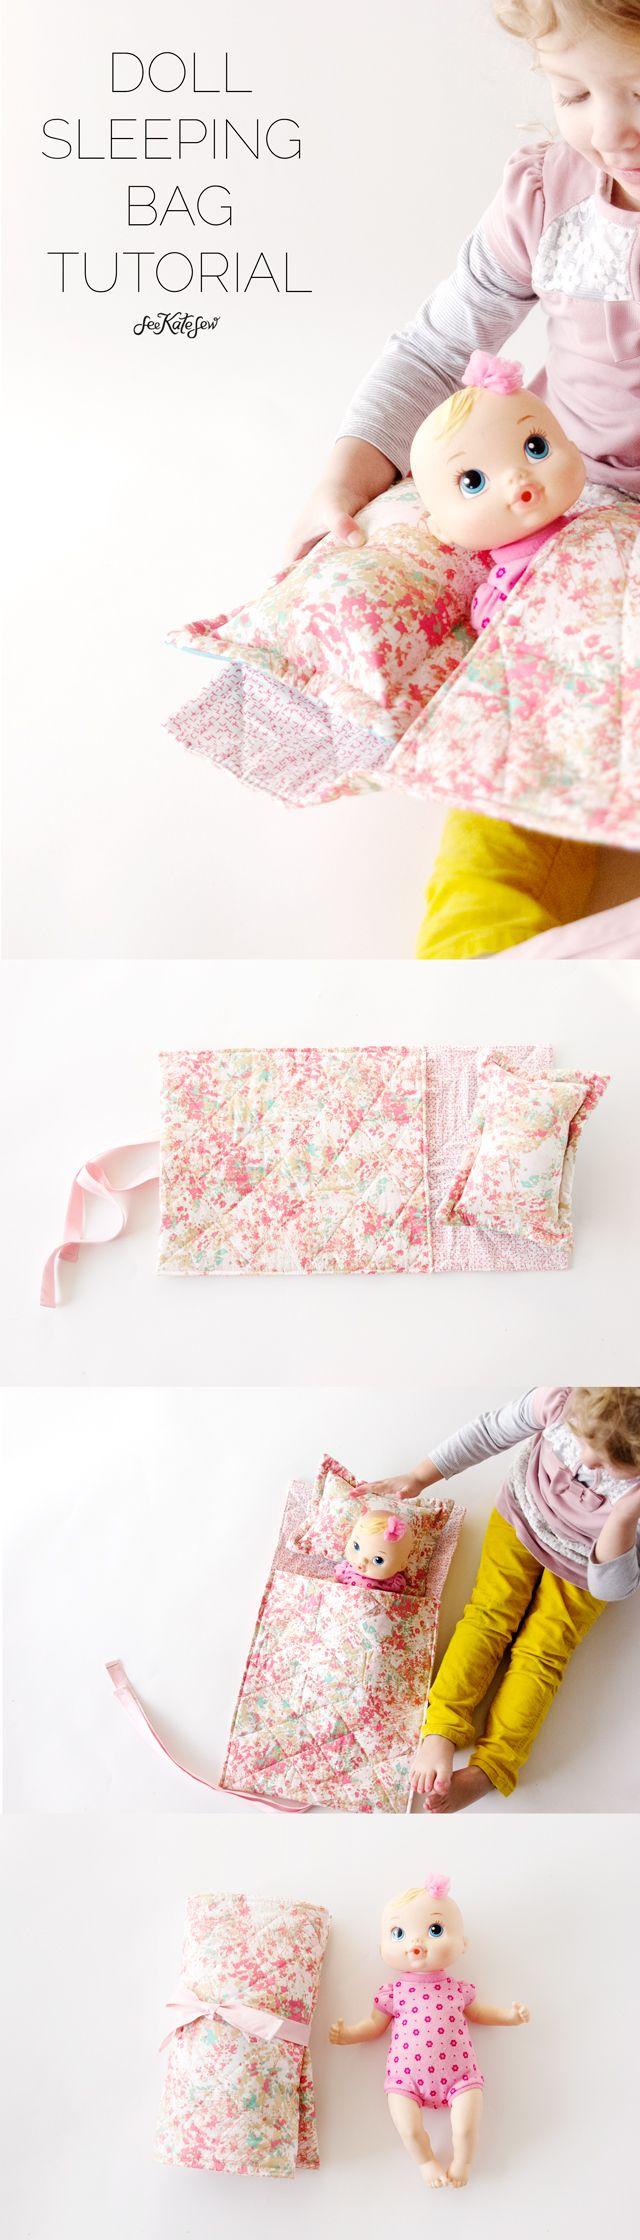 Doll sleeping bag tutorial   See Kate Sew (would make a darling Christmas present)